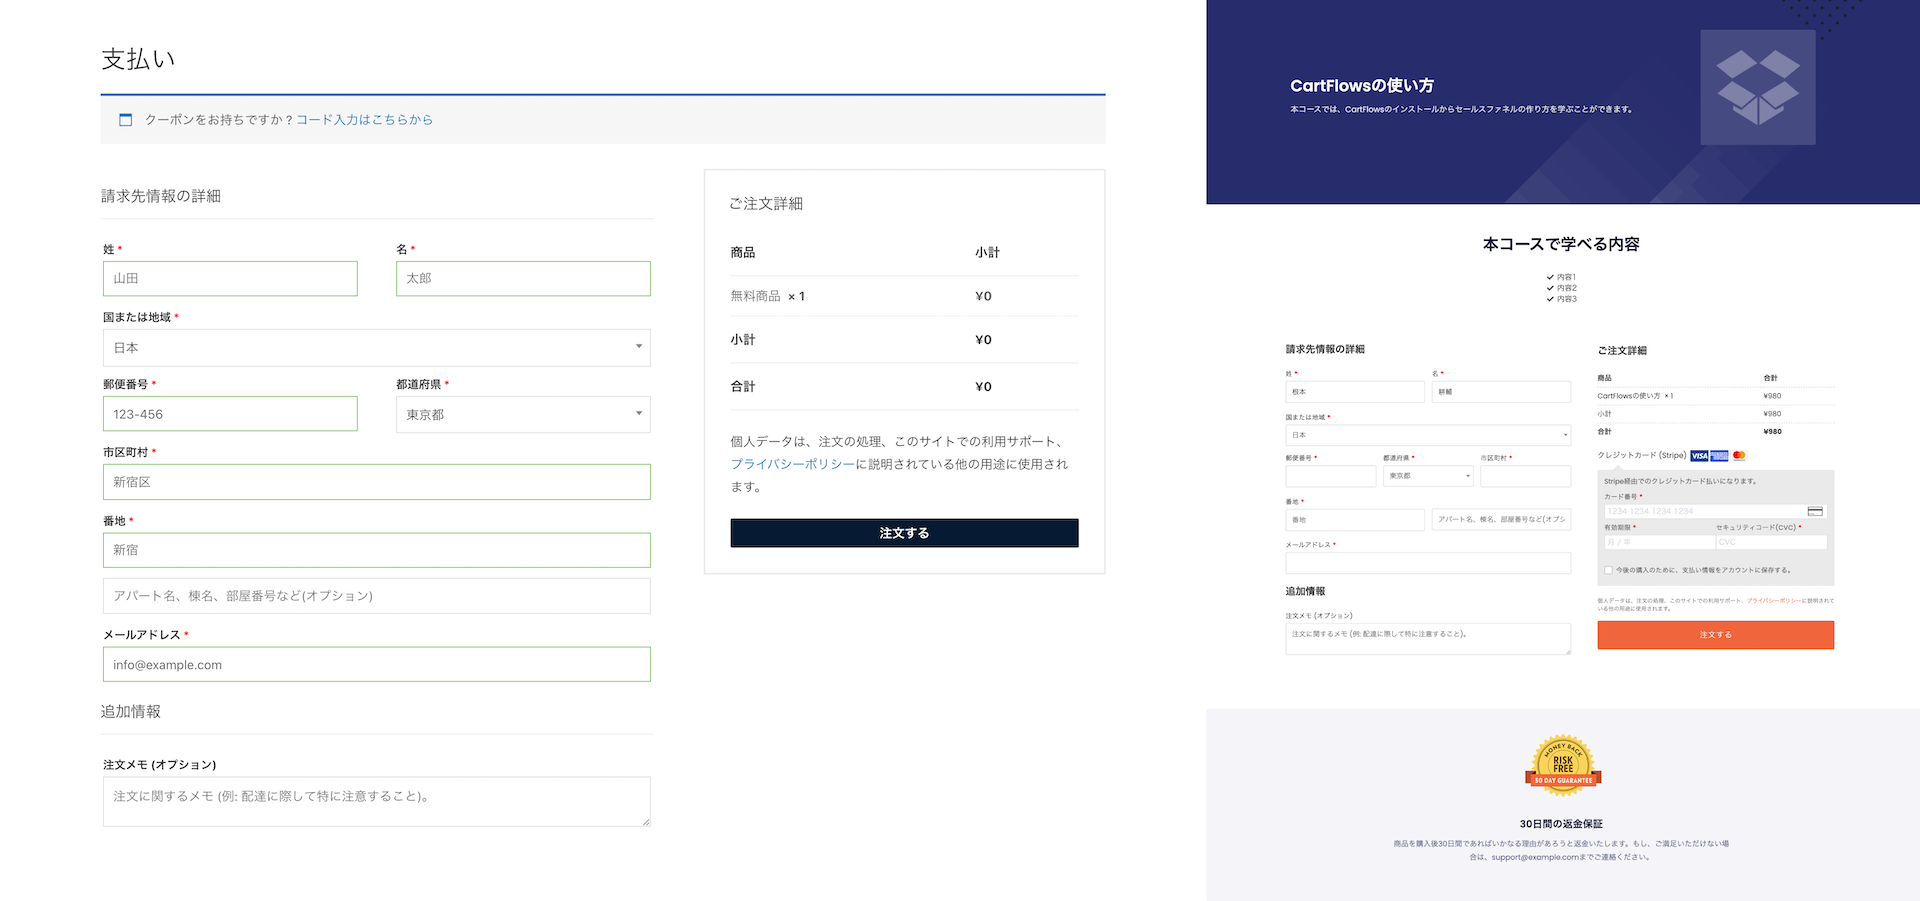 WooCommerceとCartFlowsのチェックアウトページの比較